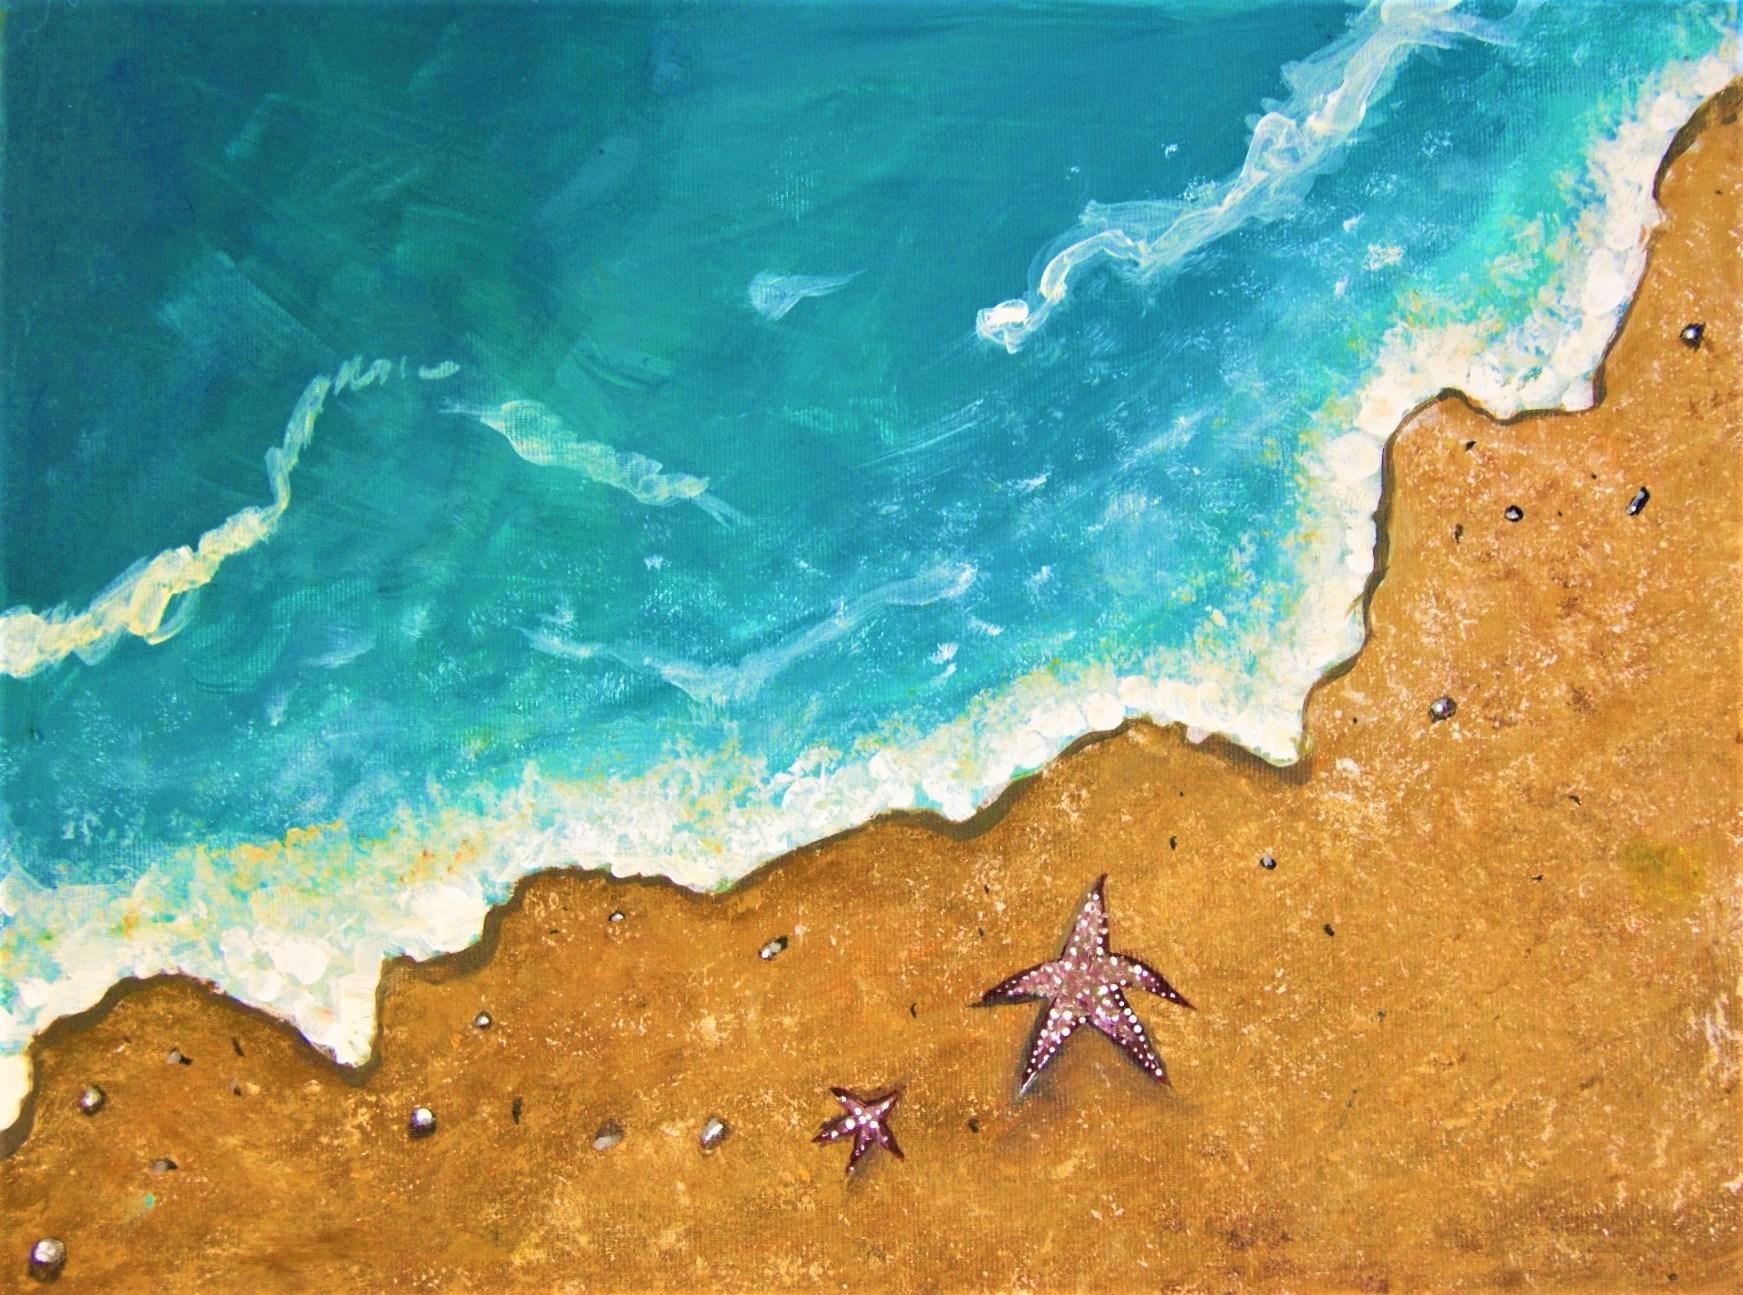 Acuarela Cocktails: Warm Beach Waves @ Marty City